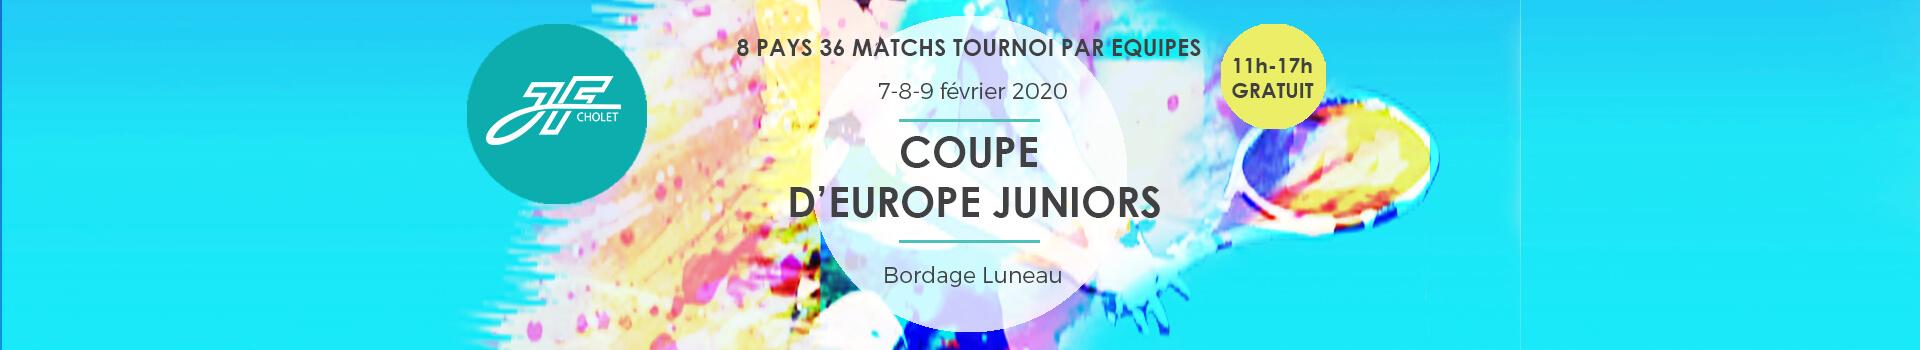 bandeau_evenement_WINTER-CUP2020